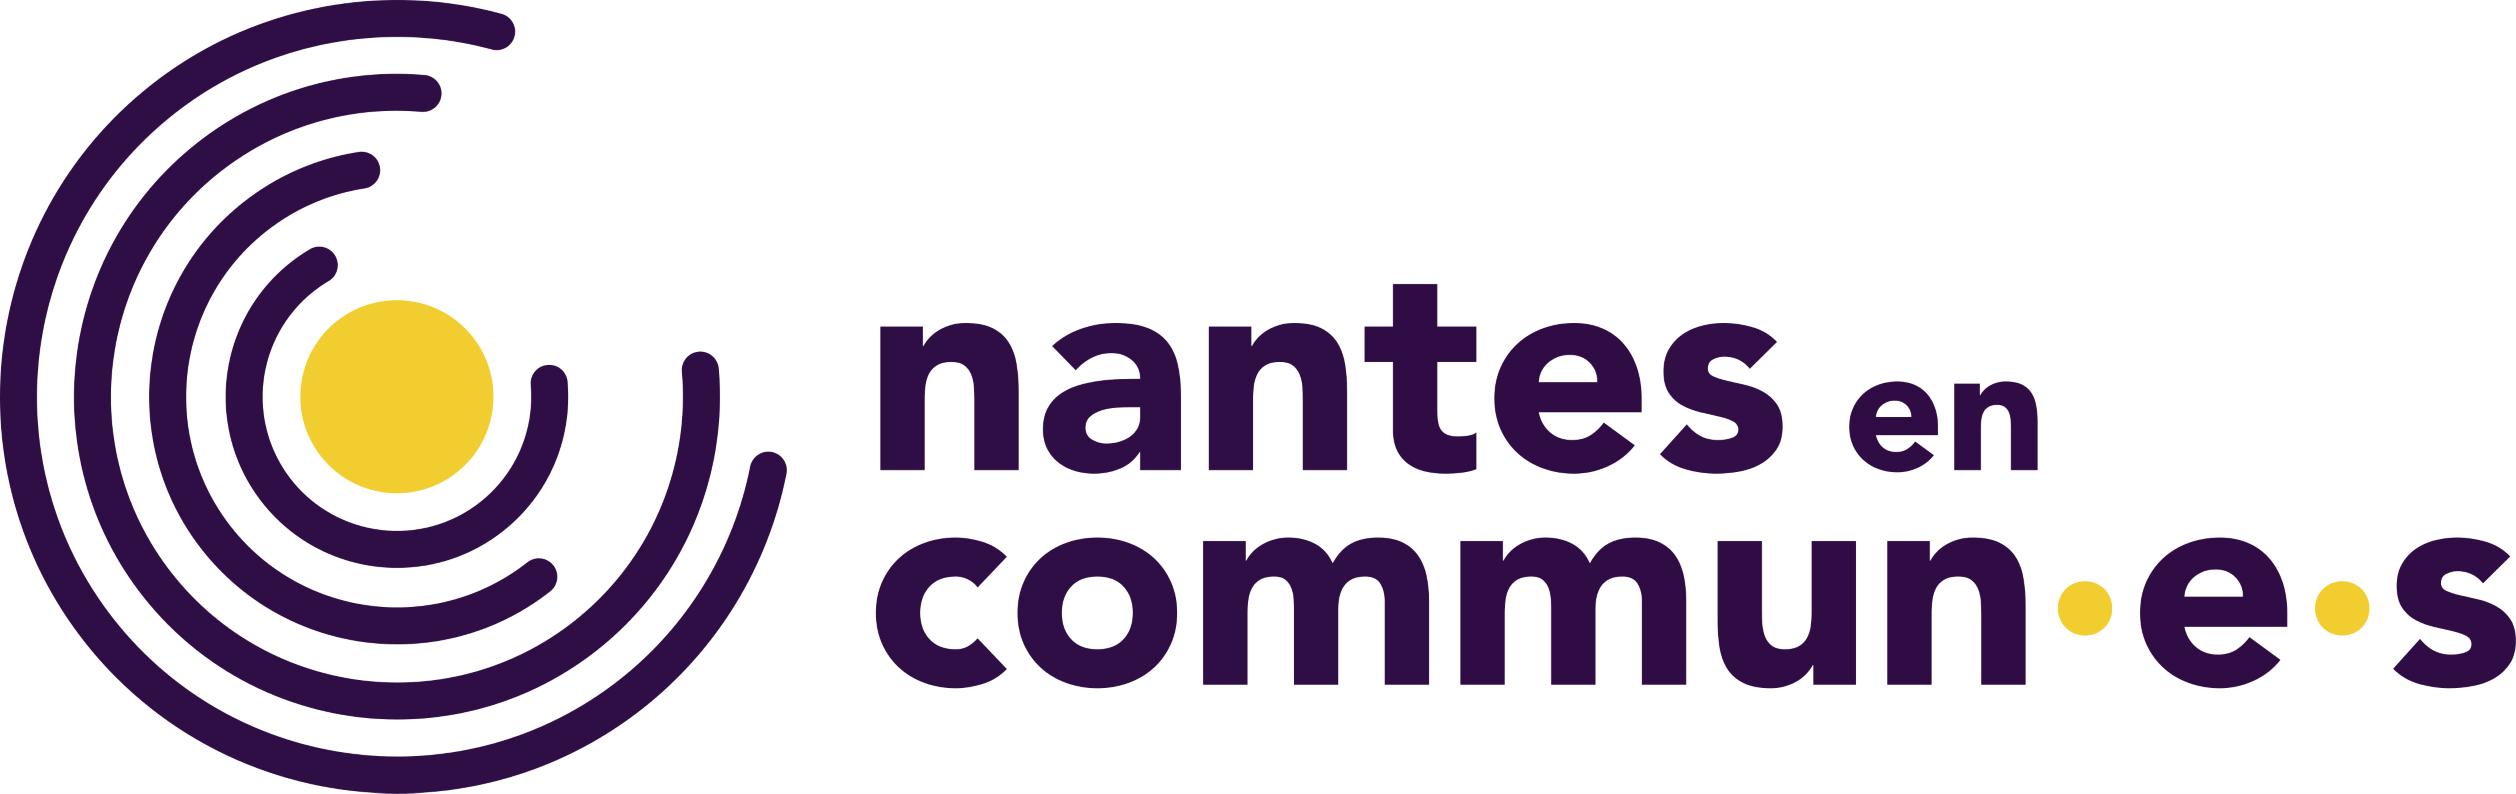 Nantes en commun·e·s